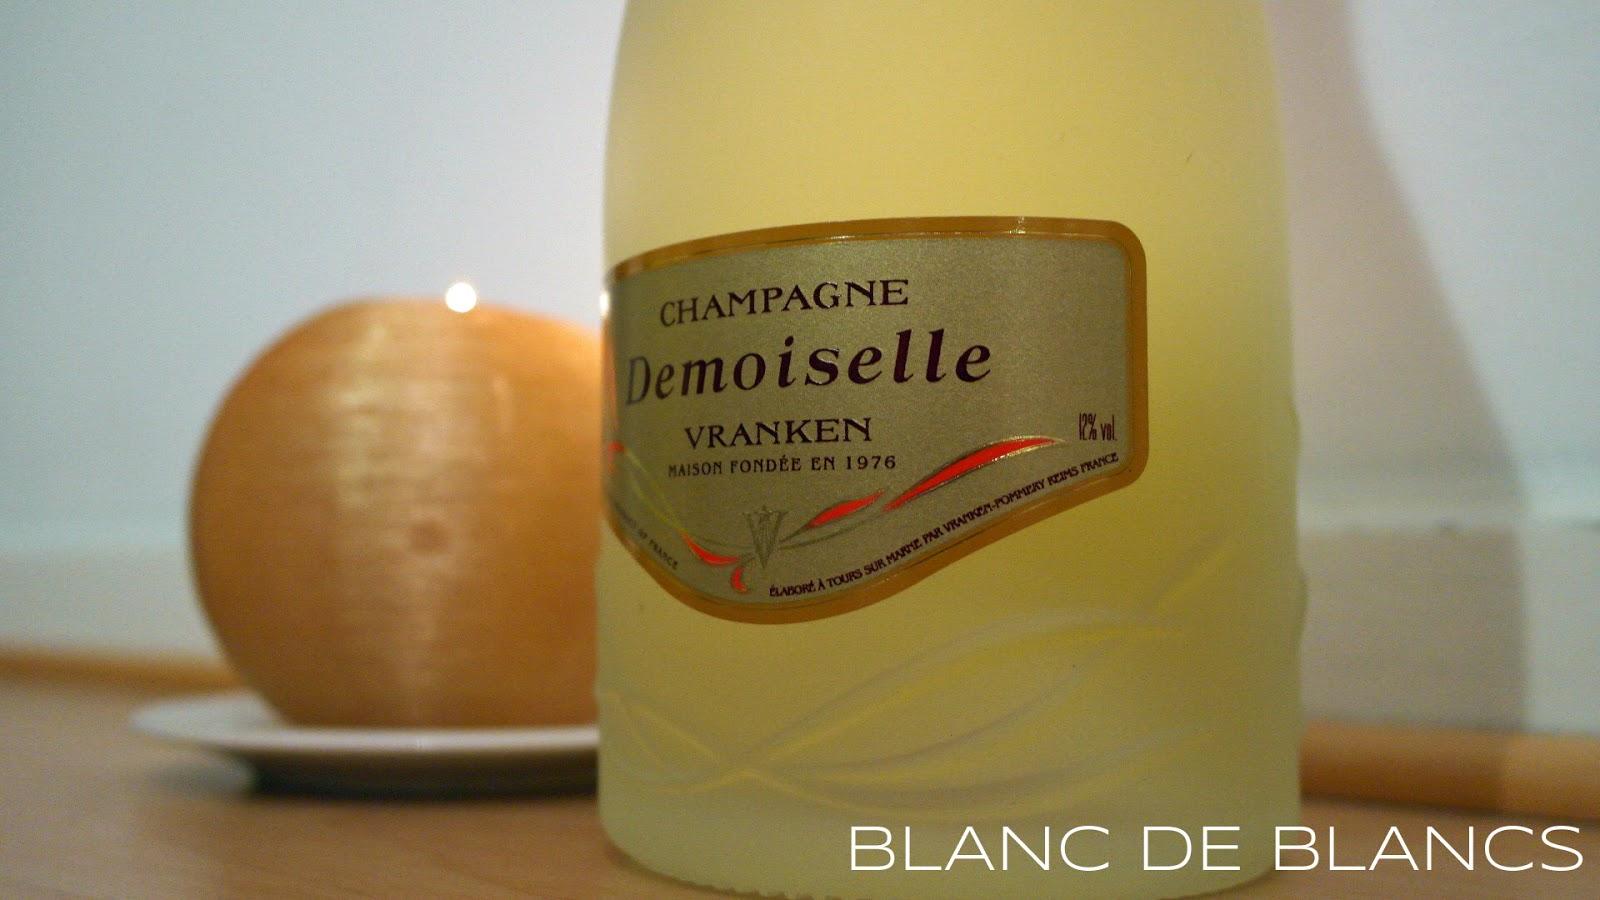 Demoiselle Vranken Cuvée Brut - www.blancdeblancs.fi